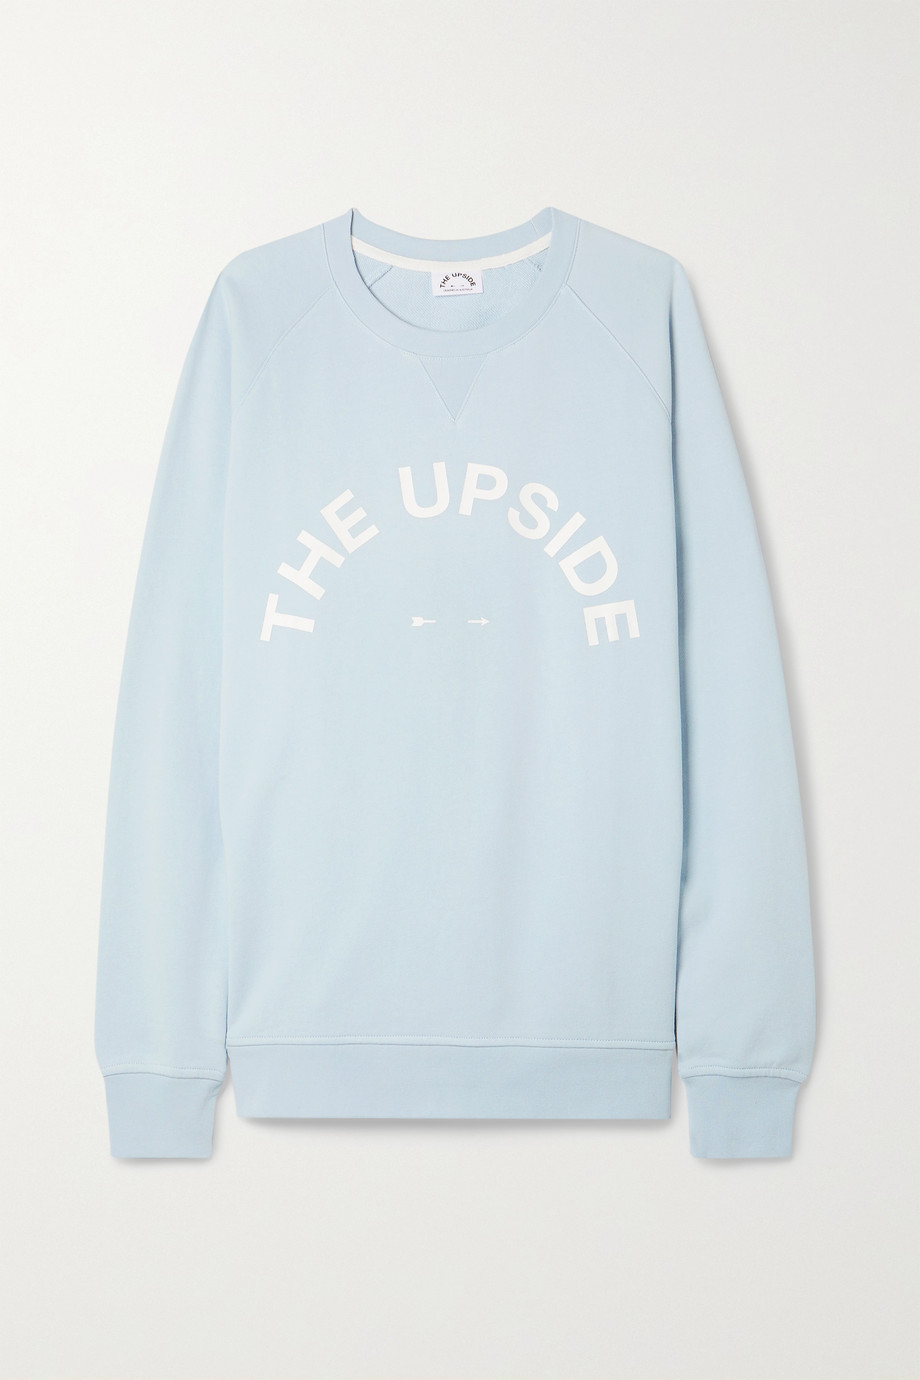 The Upside Sid printed cotton-jersey sweatshirt